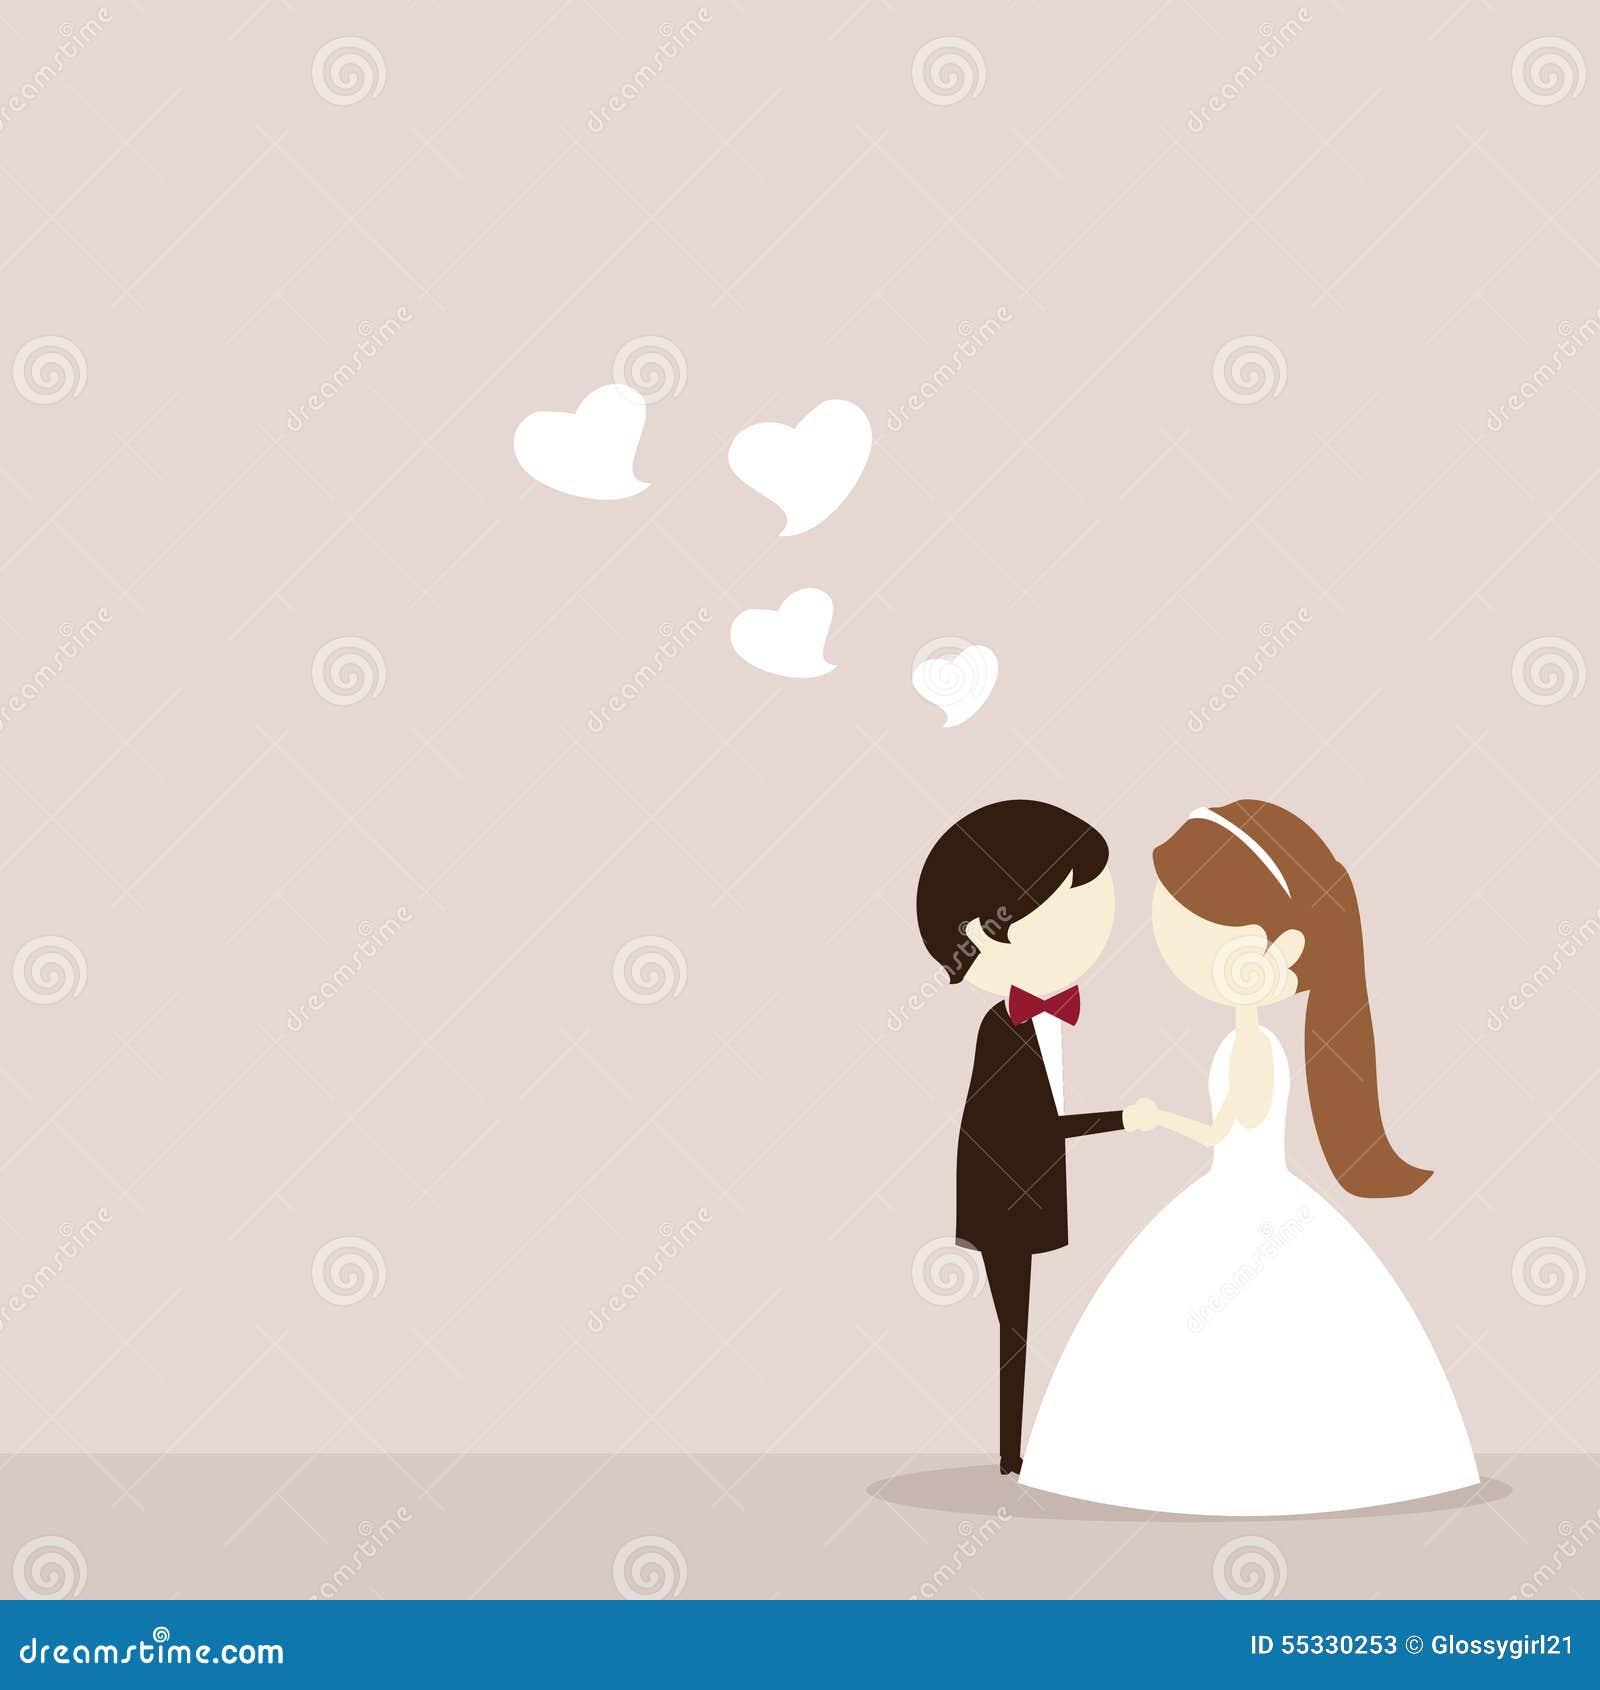 Cartoon Wedding Couple Stock Illustration Illustration Of Backdrop 55330253